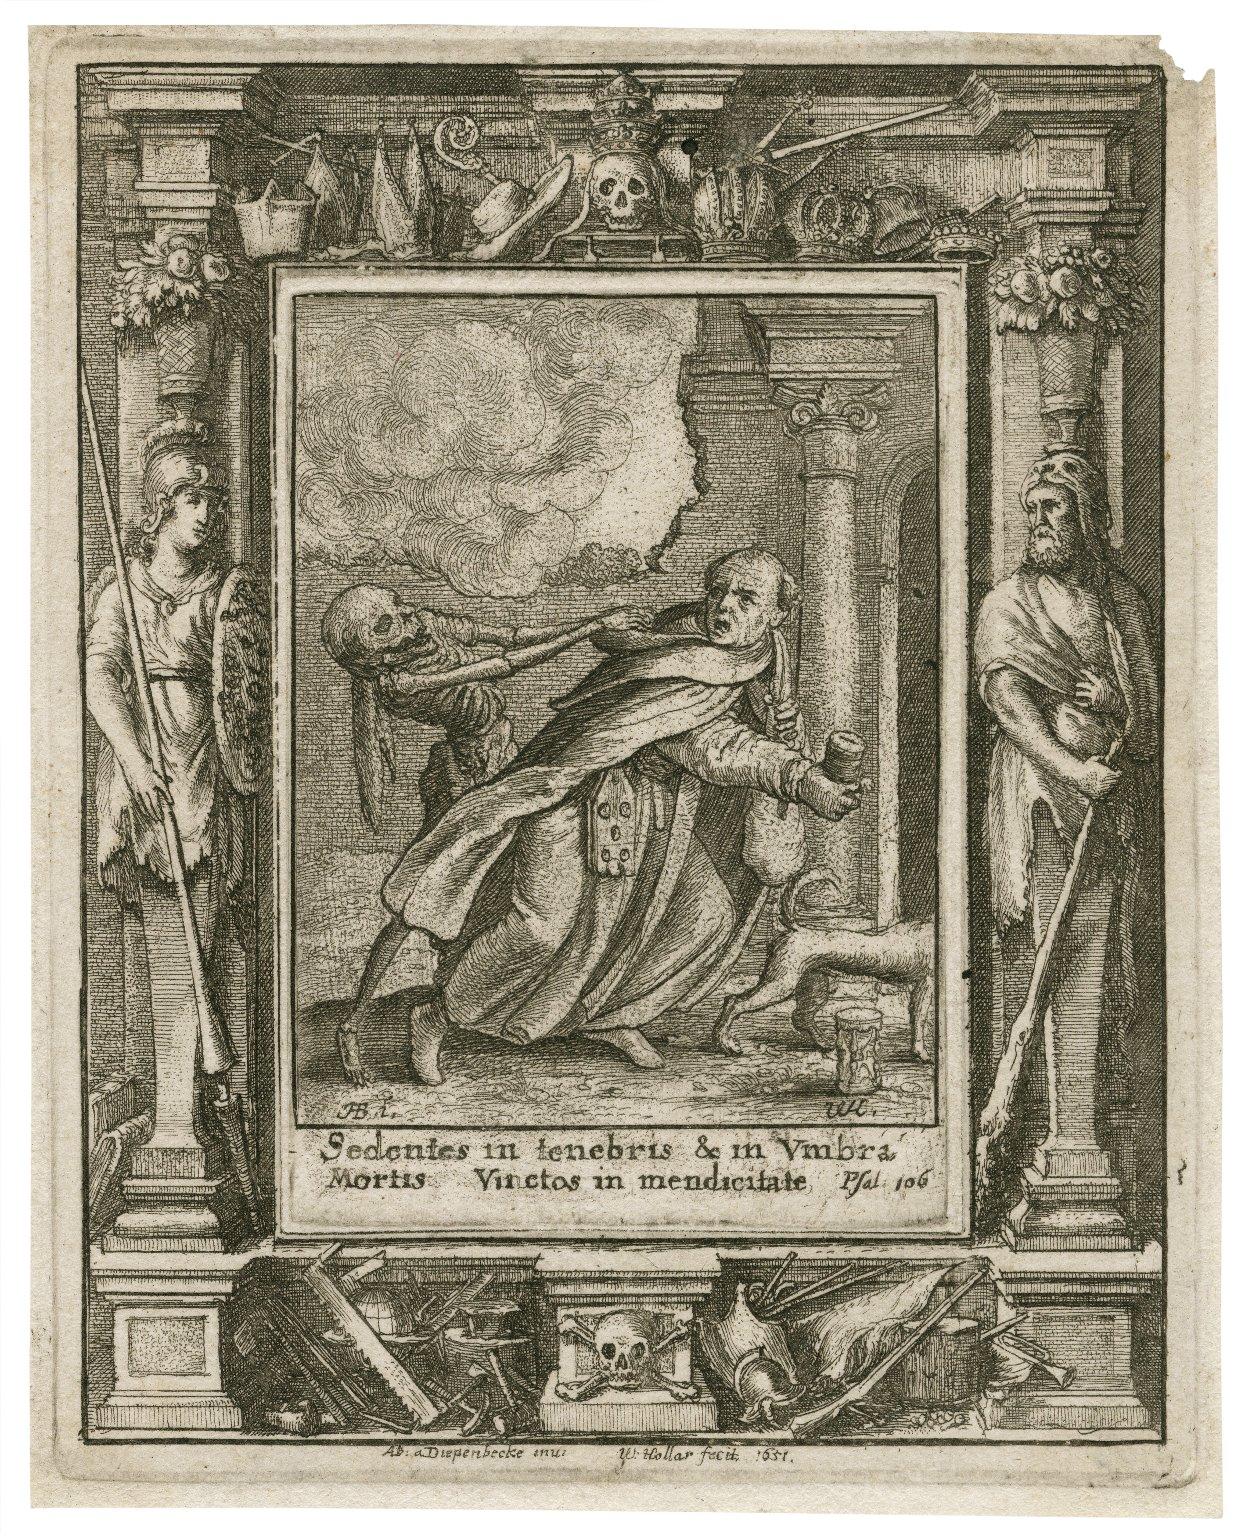 Sedentes in tenebris & in vmbra mortis vinctos in mendicitate, Psal. 106 [graphic] / H.B. i. [center plate] ; W.H. [center plate] ; Ab. a Diepenbecke inu. [border] ; W. Hollar fecit 1651 [border].